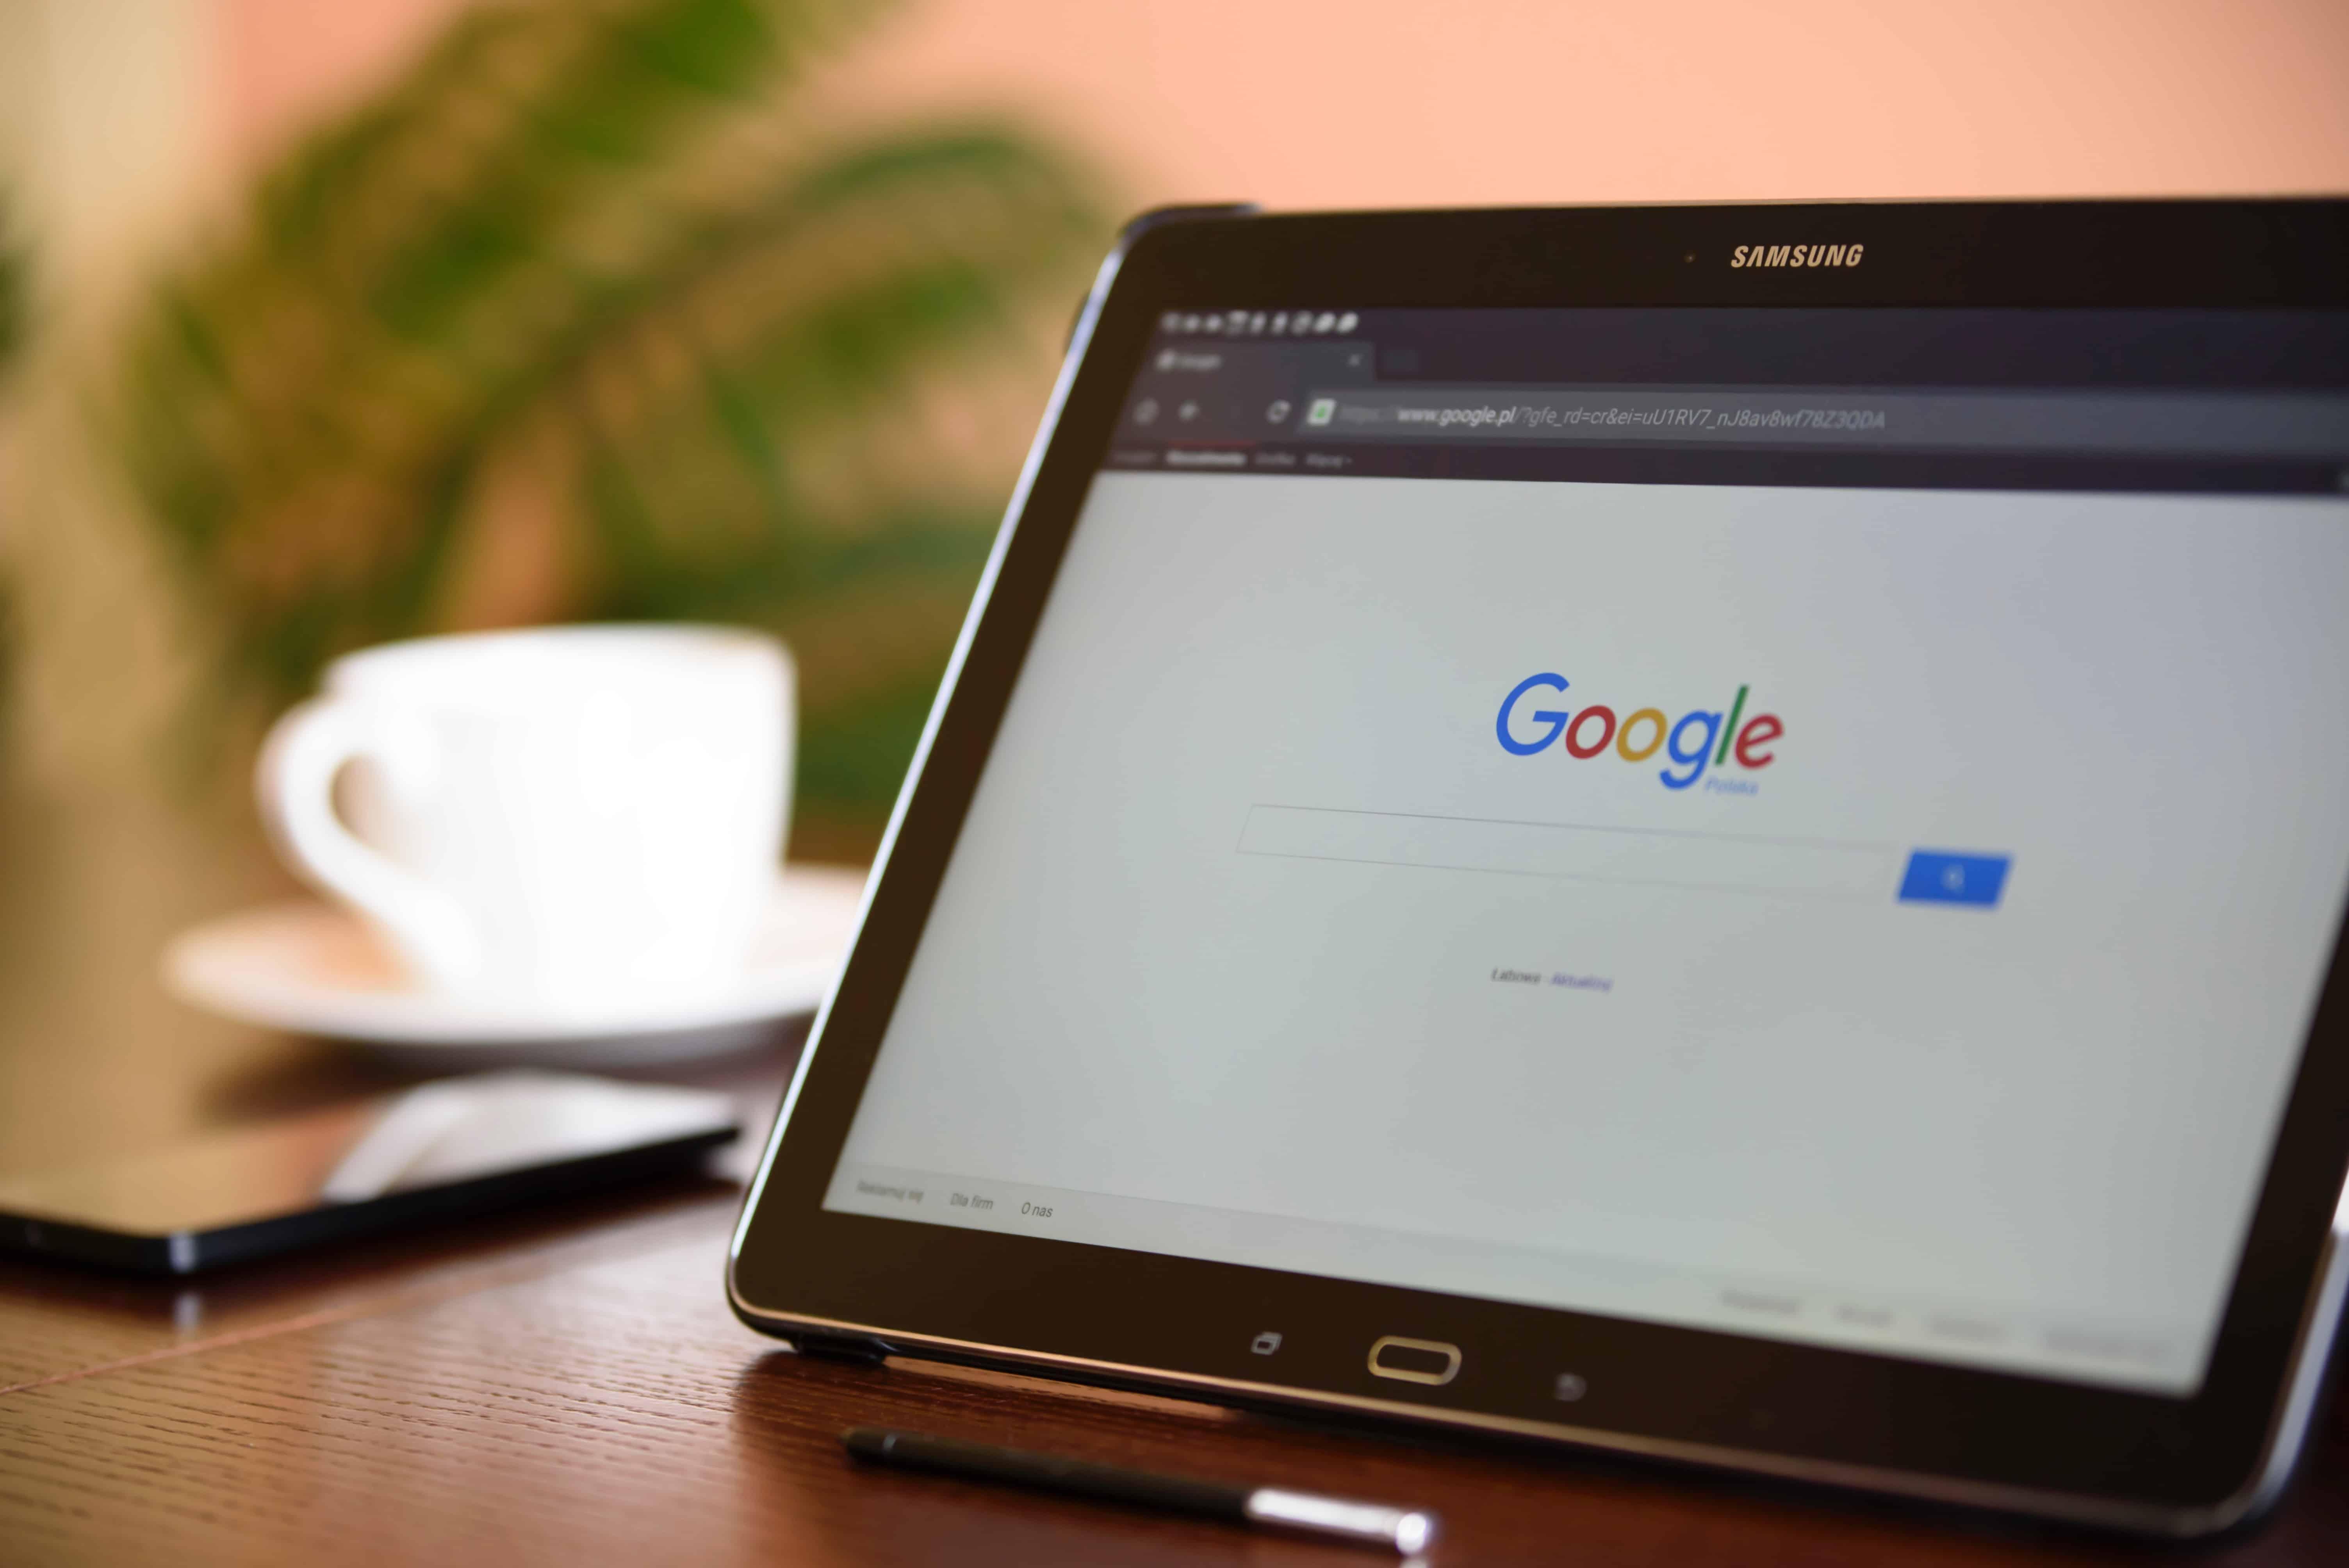 gadget-google-samsung-106341